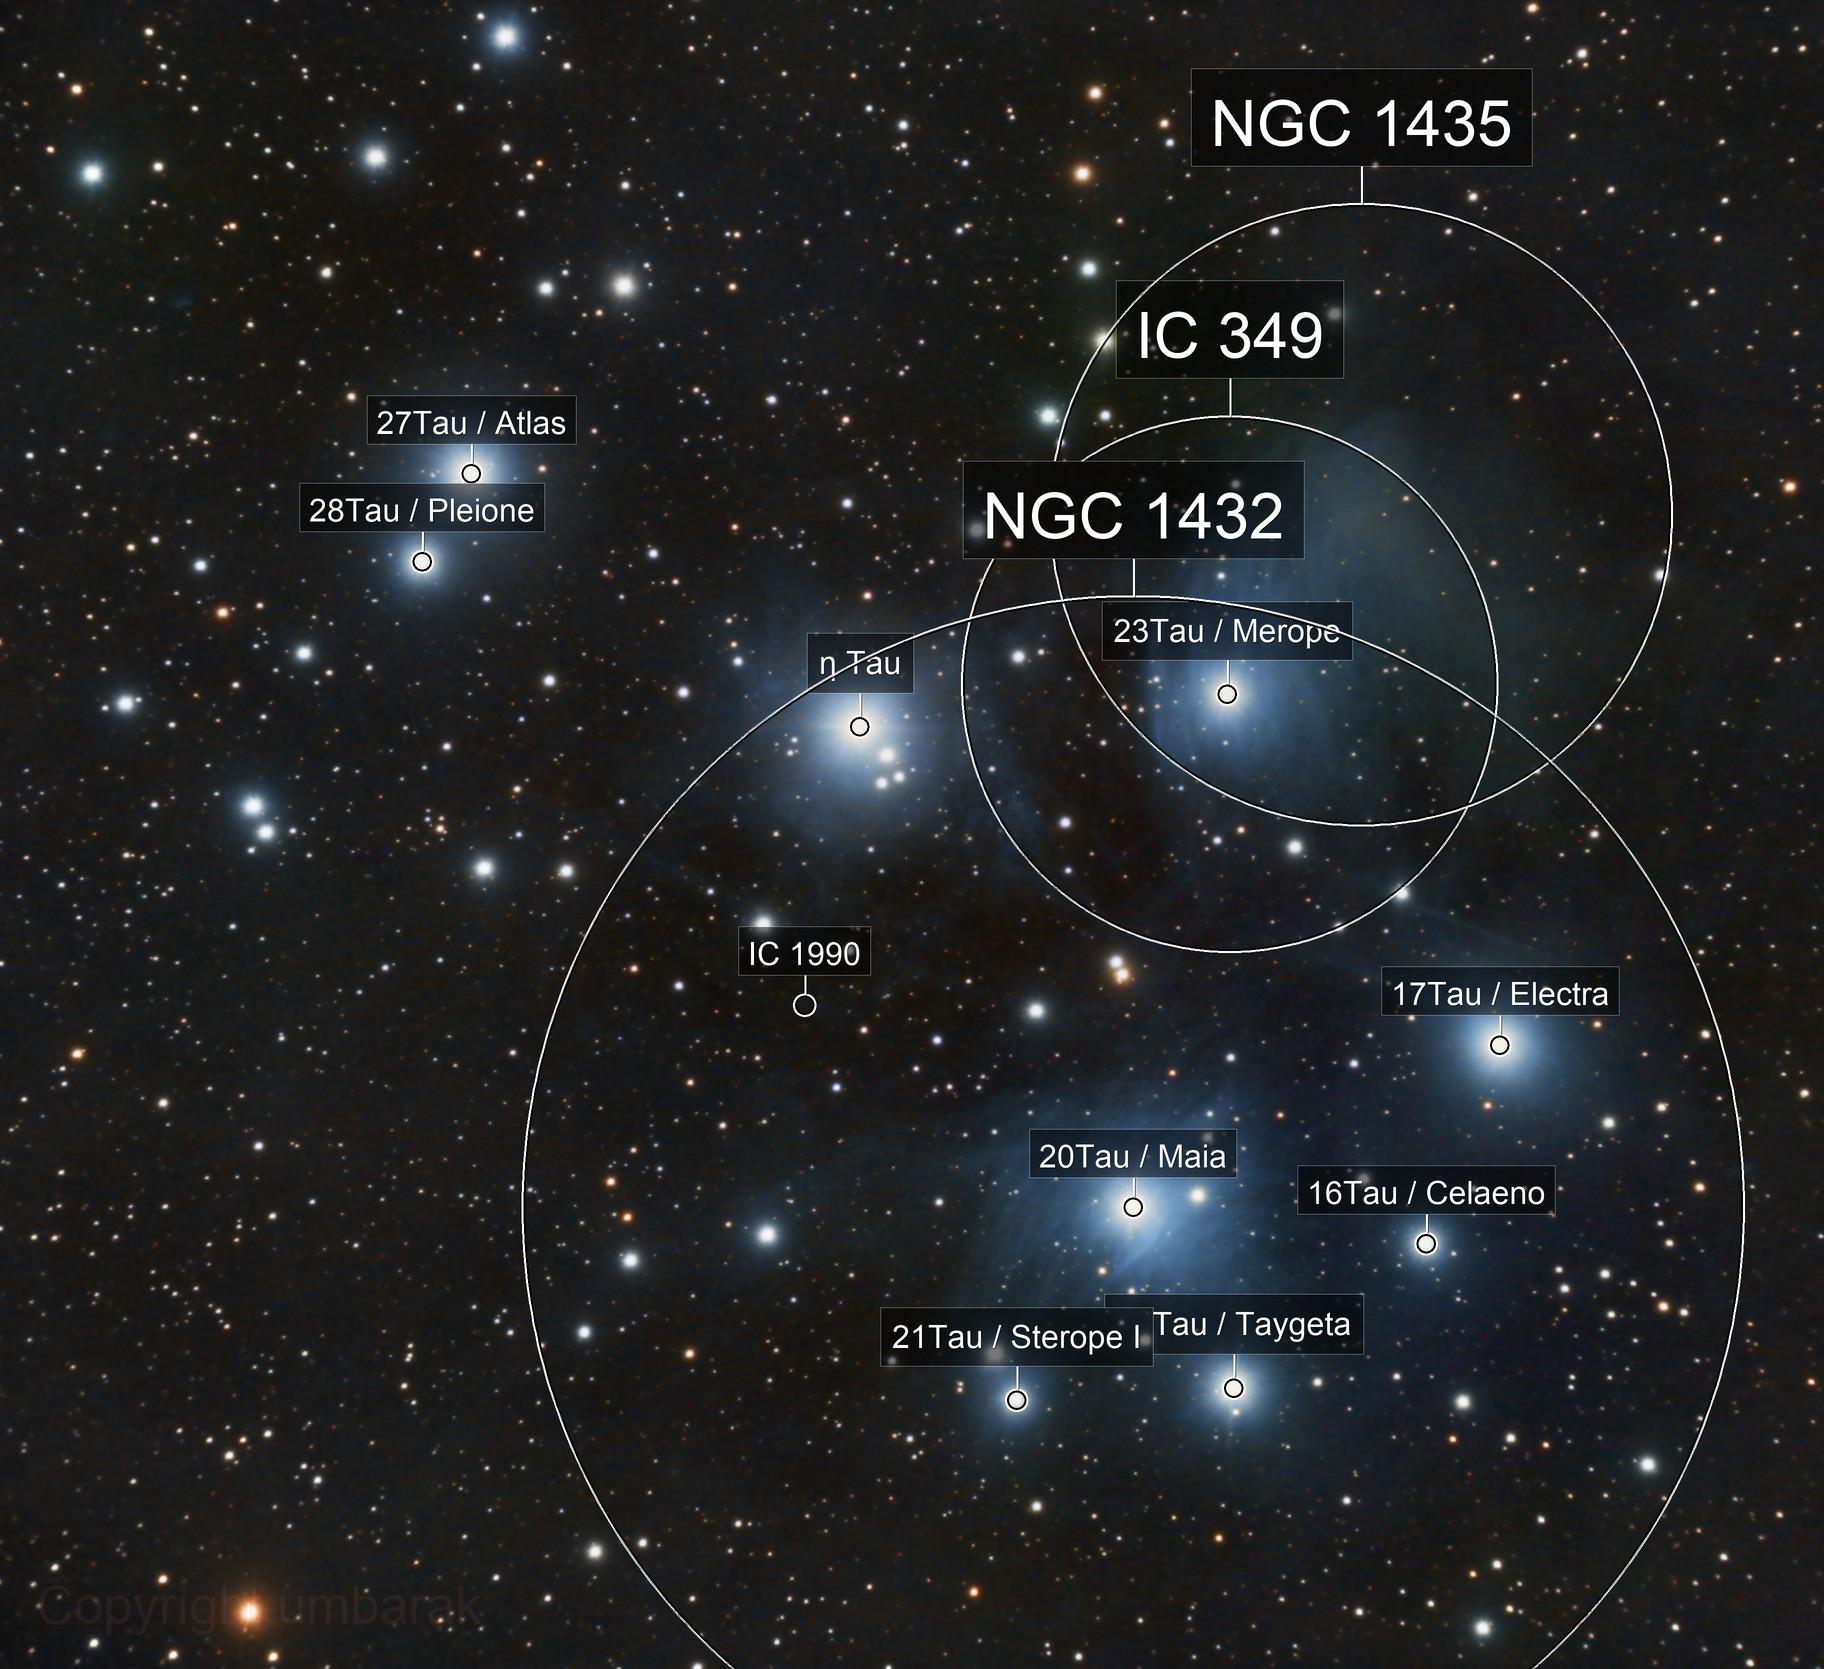 The Pleiades-M45